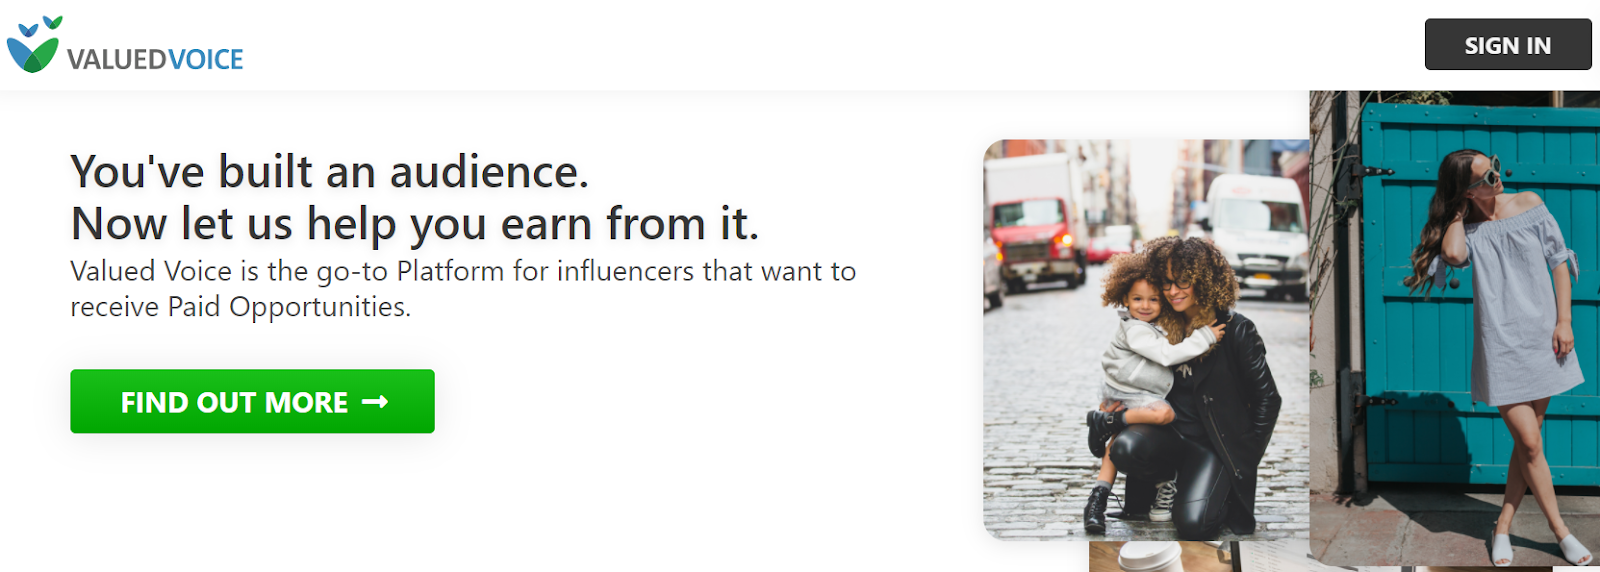 ValuedVoice for influencer marketing